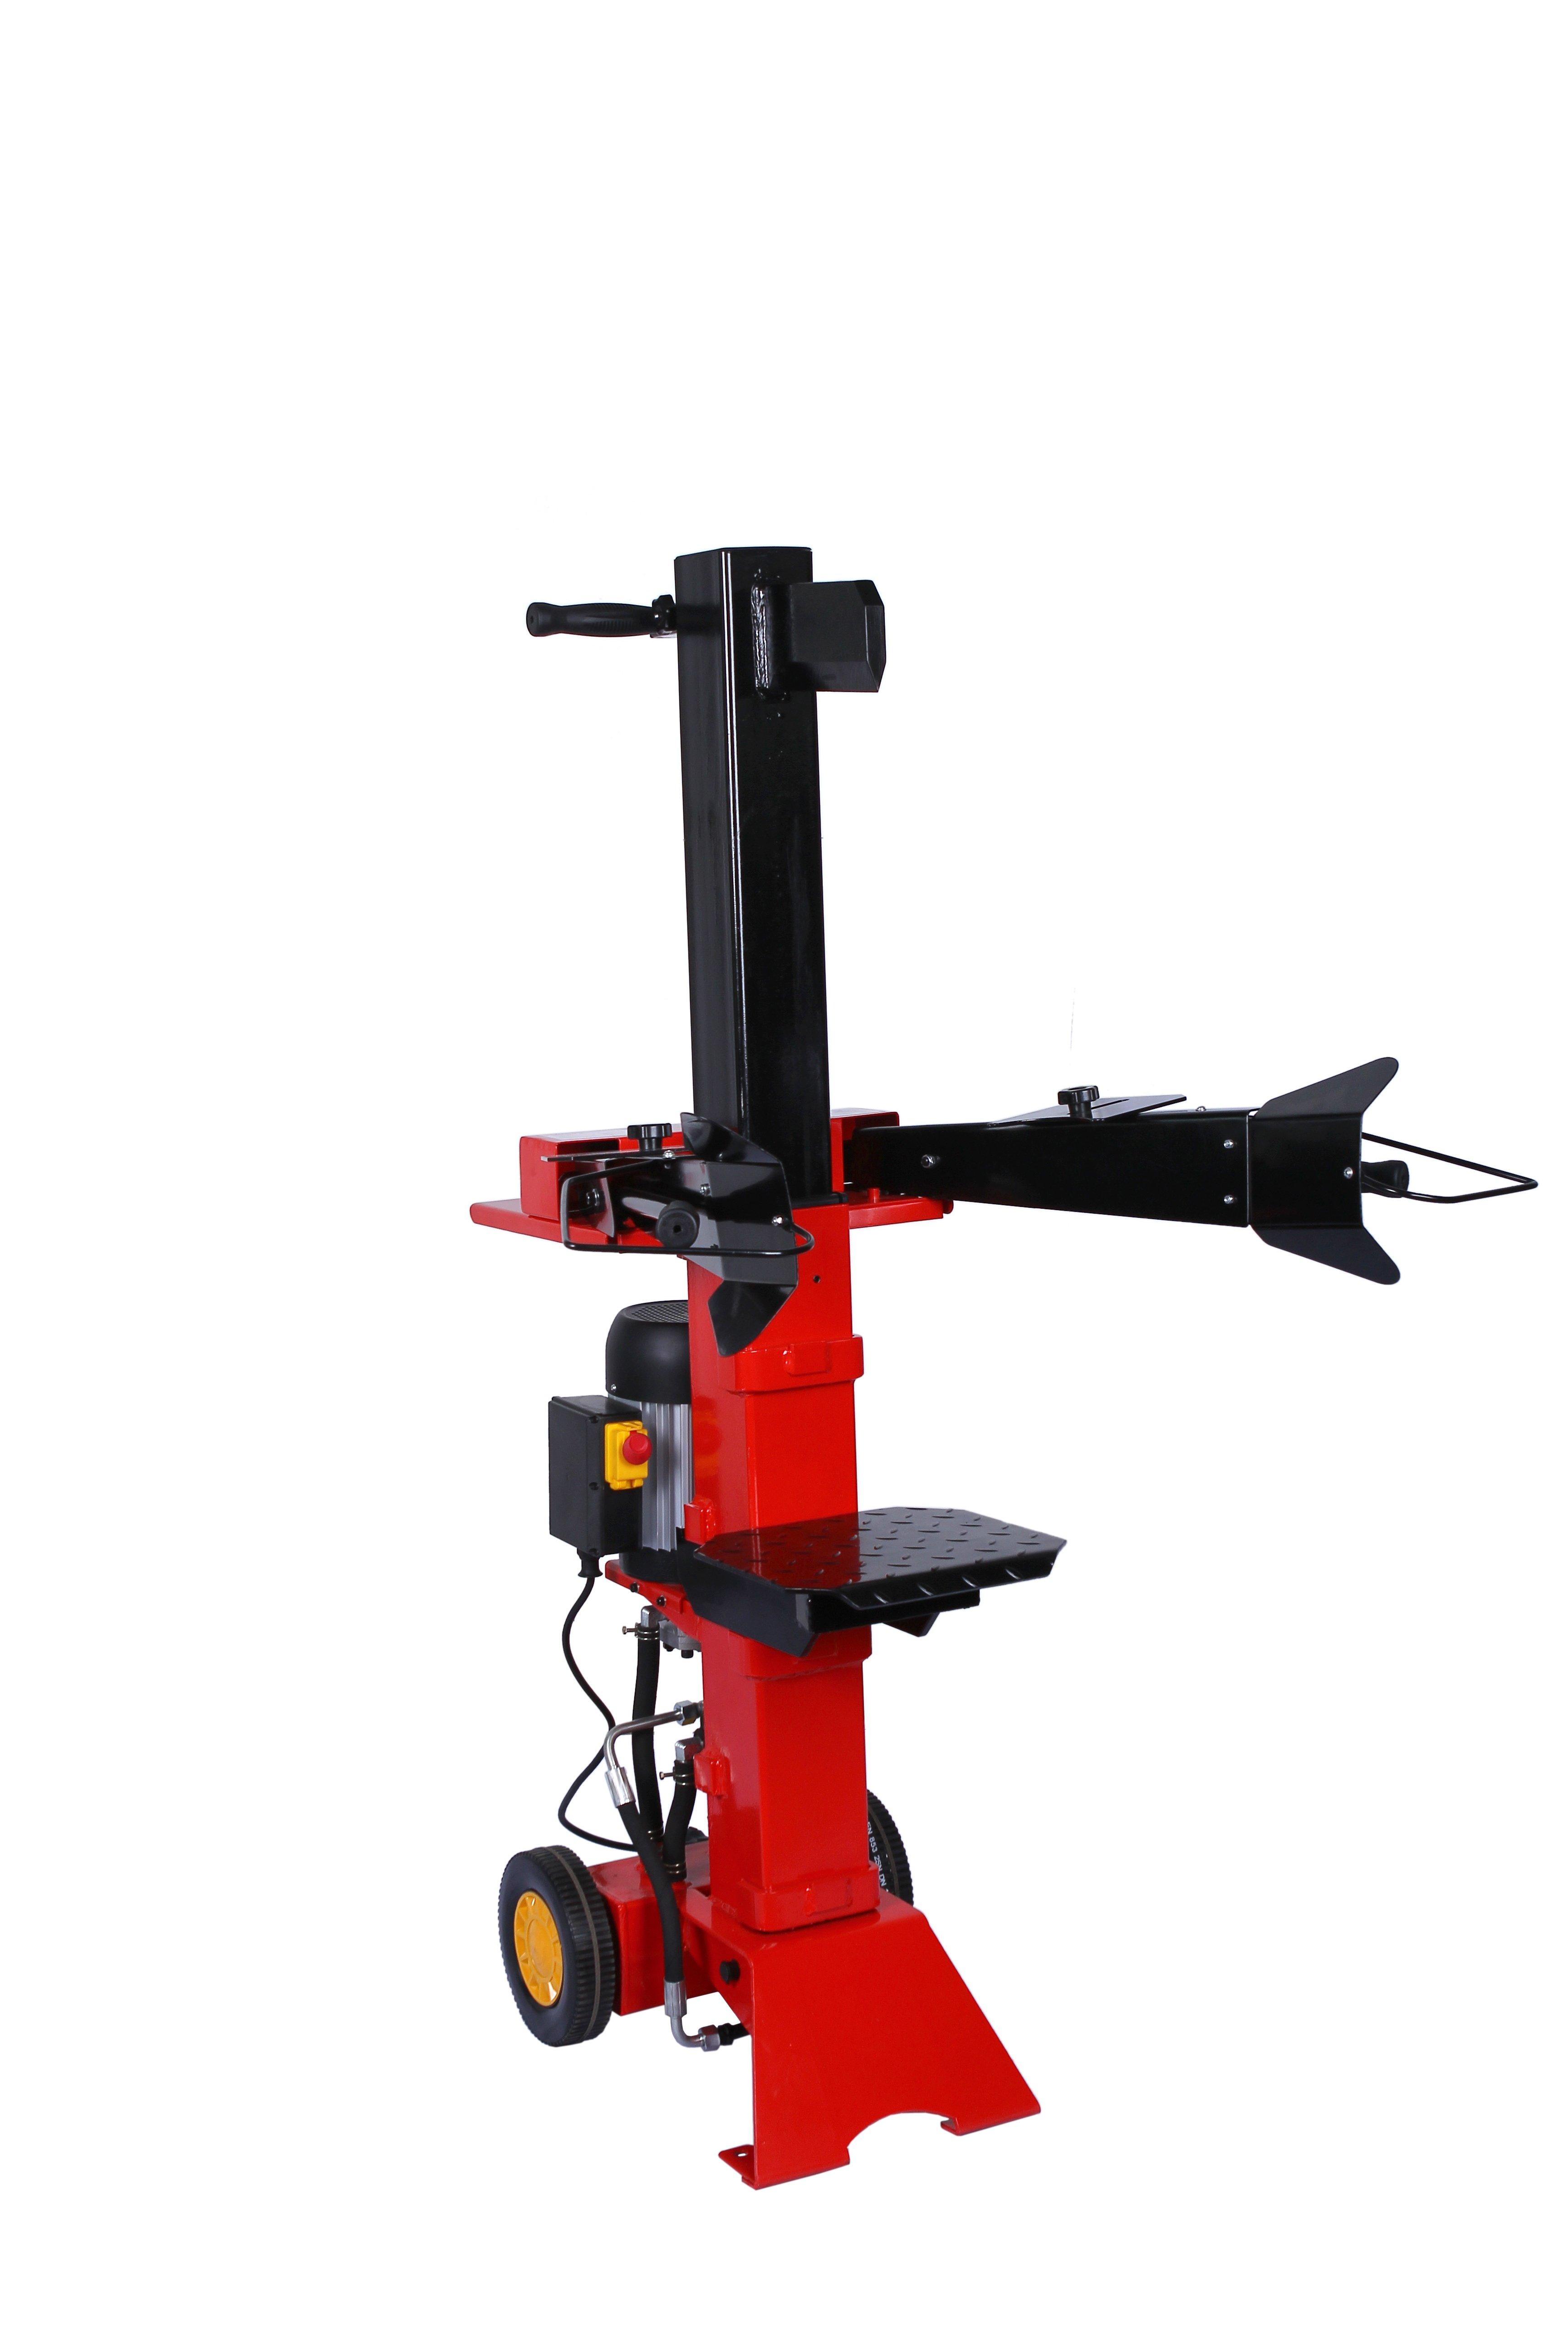 Fellotool 7 Ton Hydraulic Electric Log Splitter